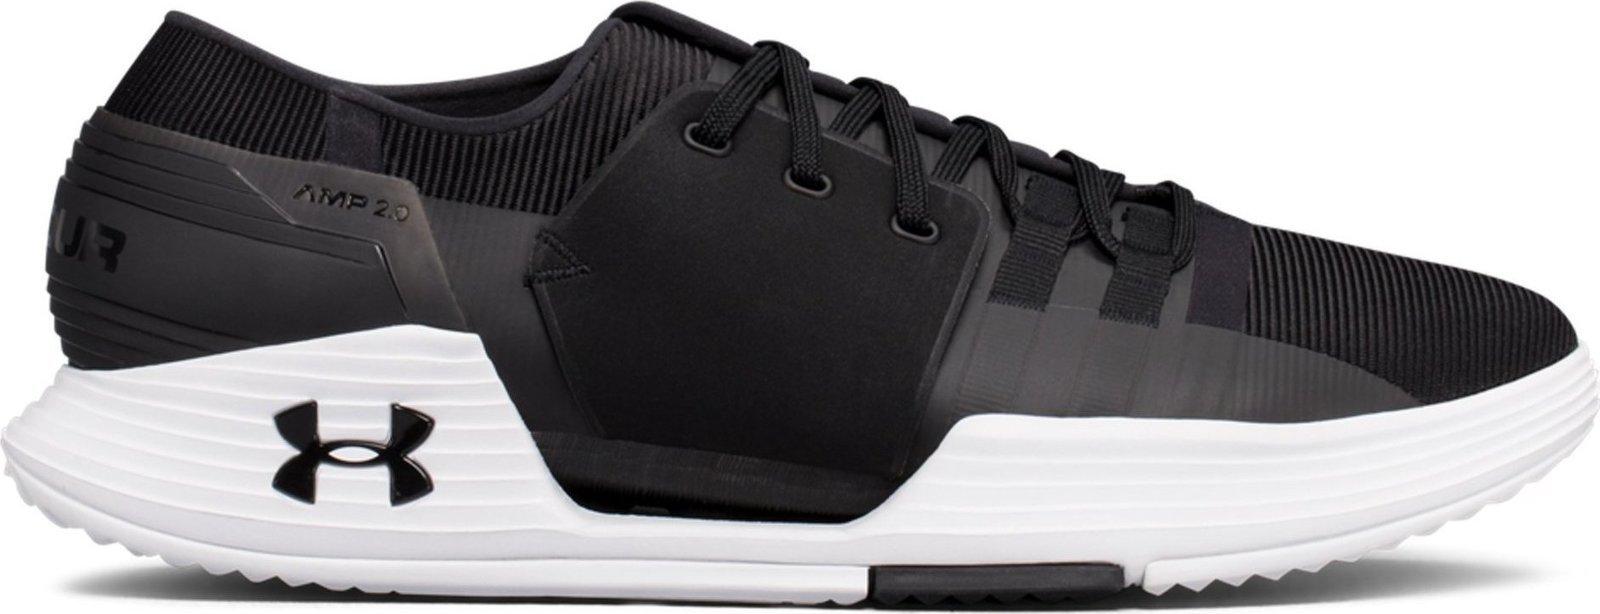 Fitness shoes Under Armour Speedform